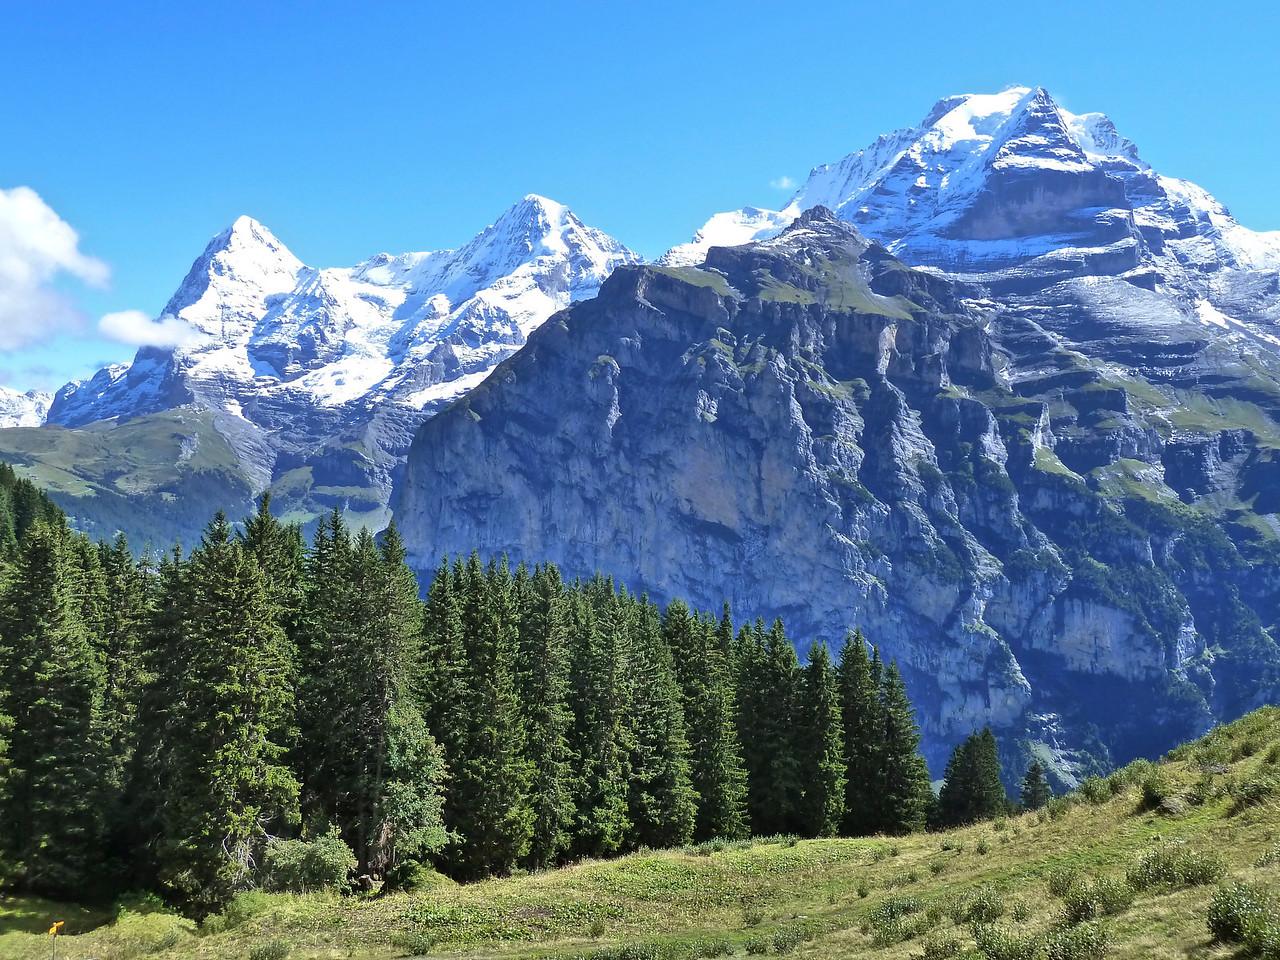 Again, the classic trio: Eiger, Mönch and Jungfrau!